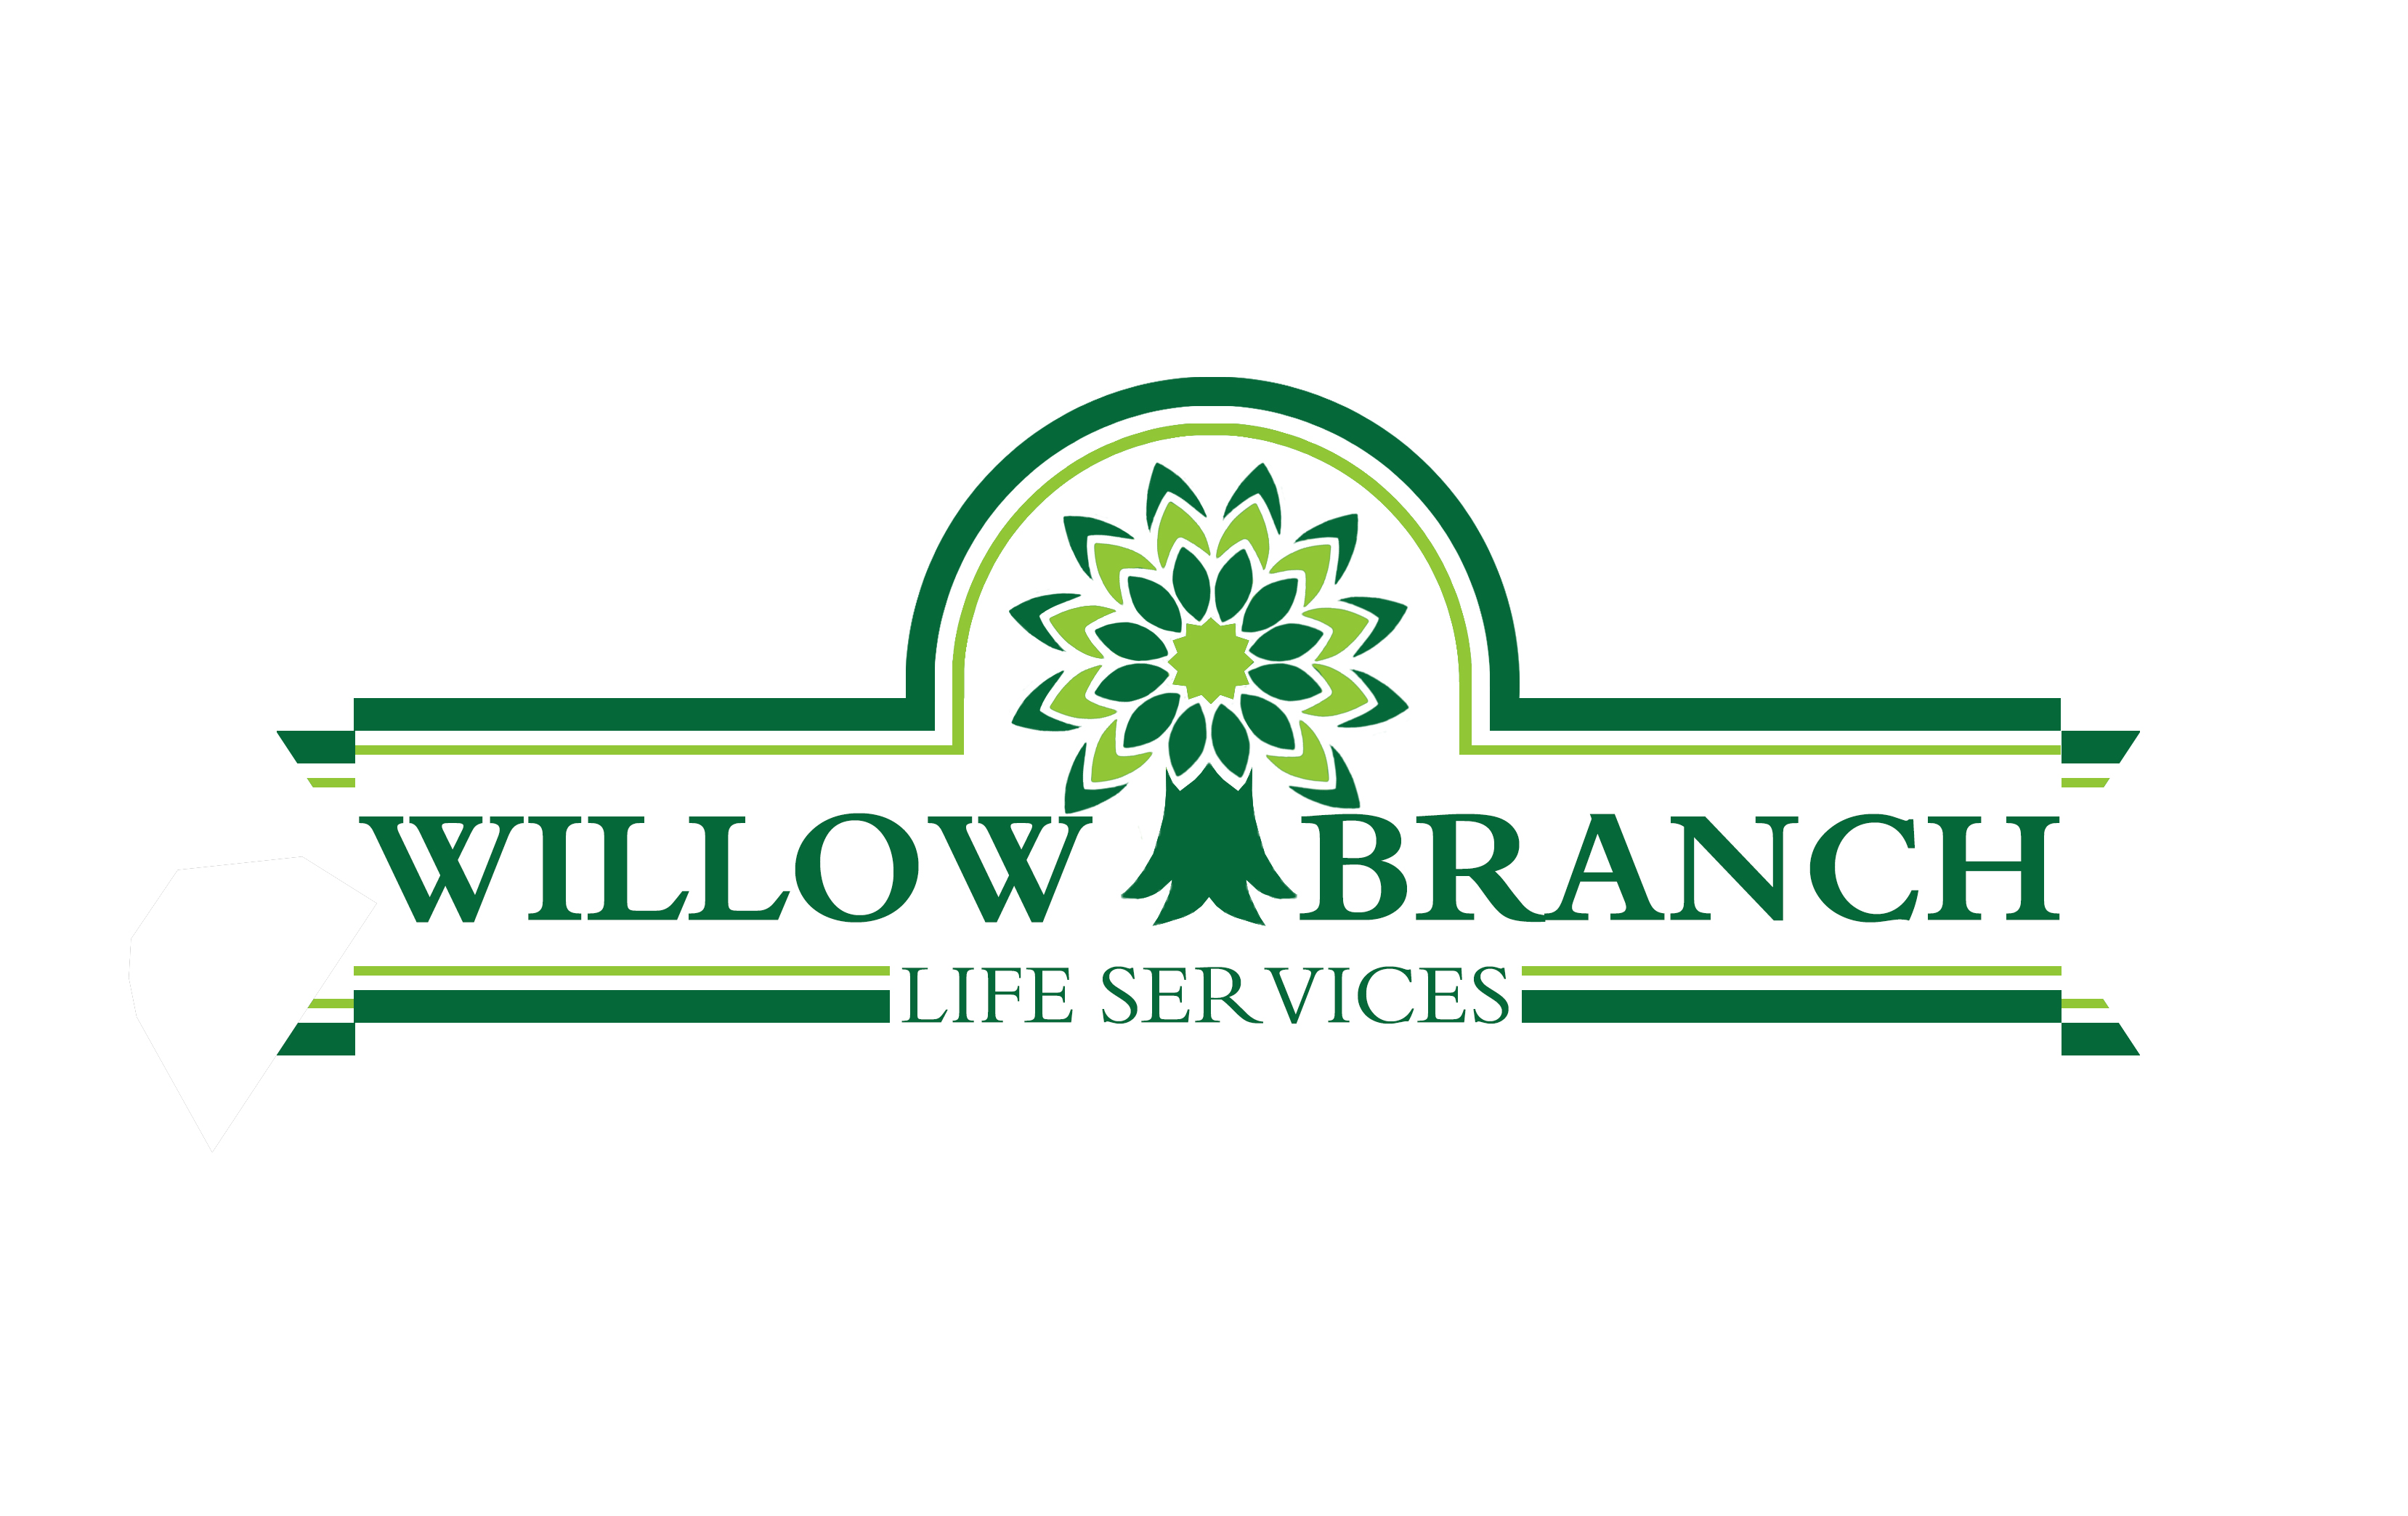 Logo Design by JSDESIGNGROUP - Entry No. 373 in the Logo Design Contest Artistic Logo Design for Willow Branch Life Service.